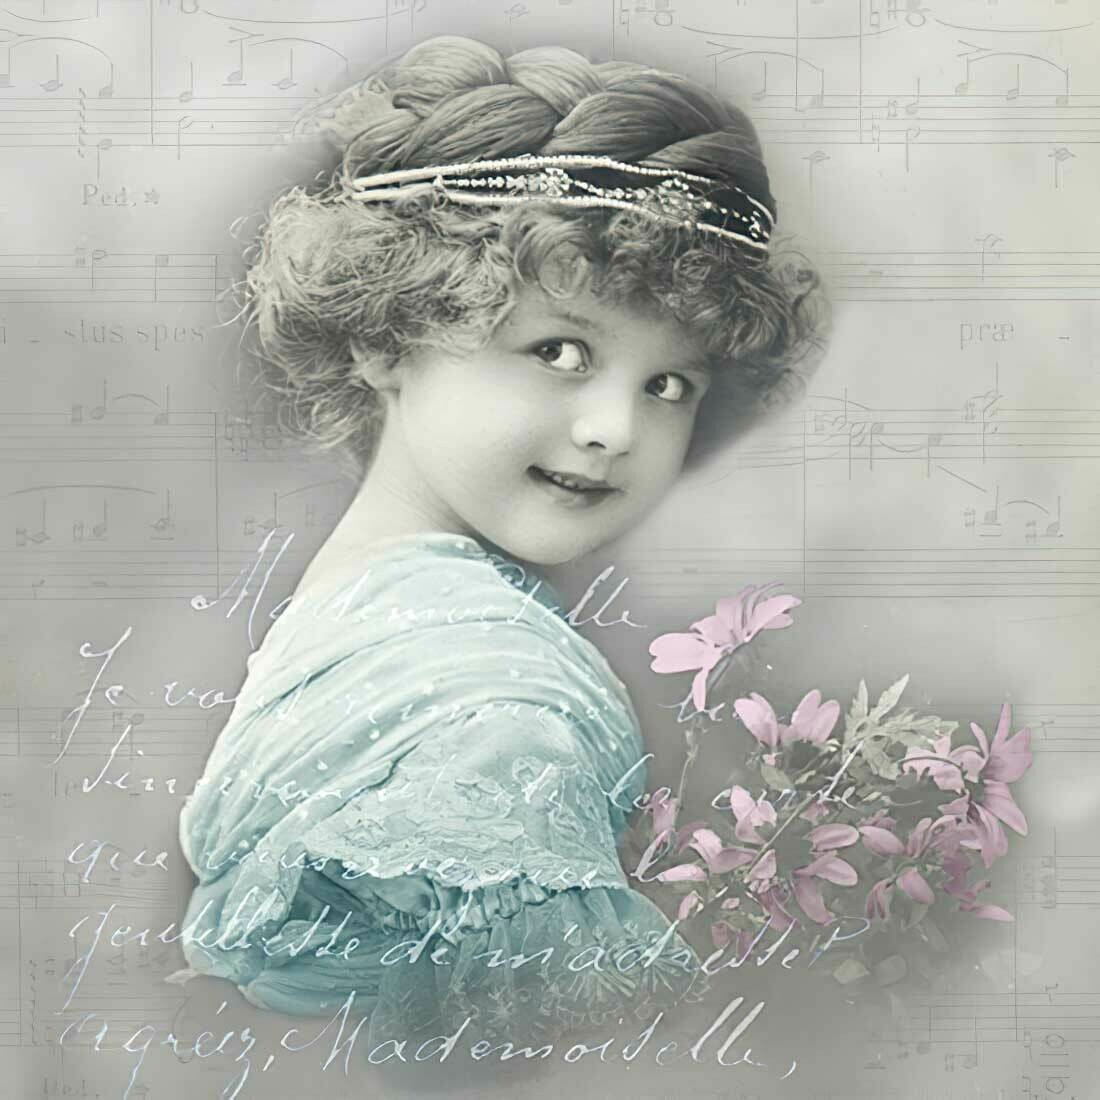 Decoupage Paper Napkins - Vintage - Turquoise Girl -13x13 (1 Sheet)